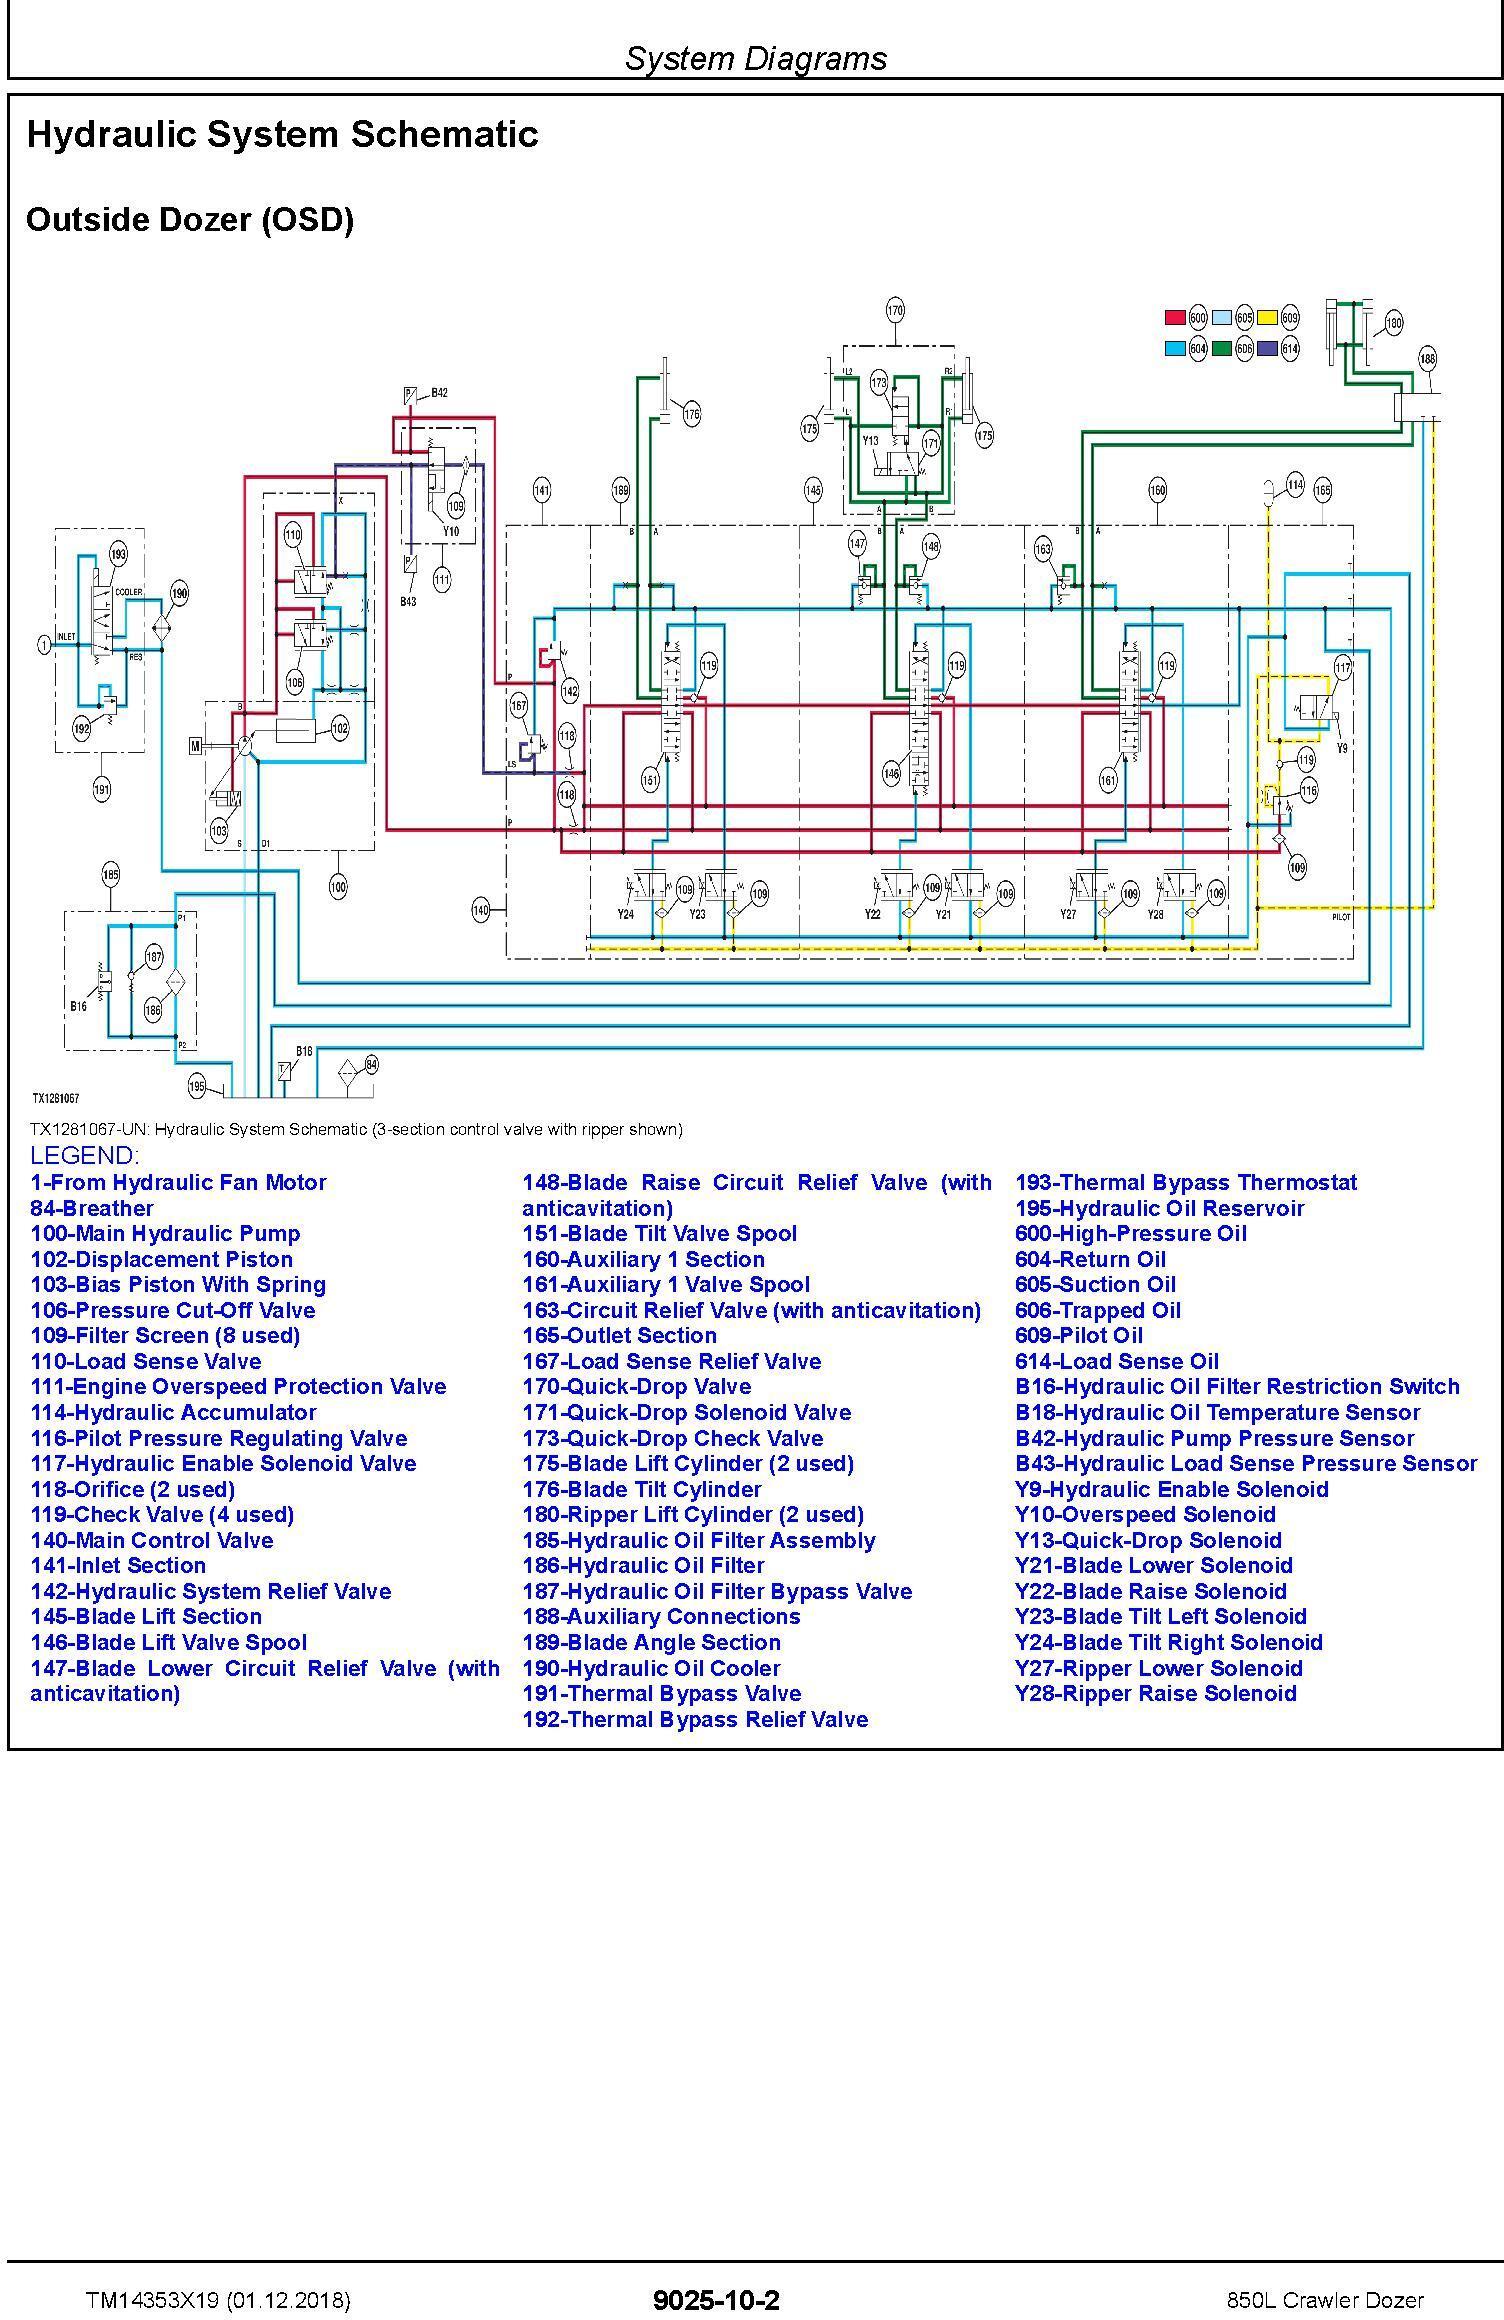 John Deere 850L Crawler Dozer Operation & Test Technical Manual (TM14353X19) - 2